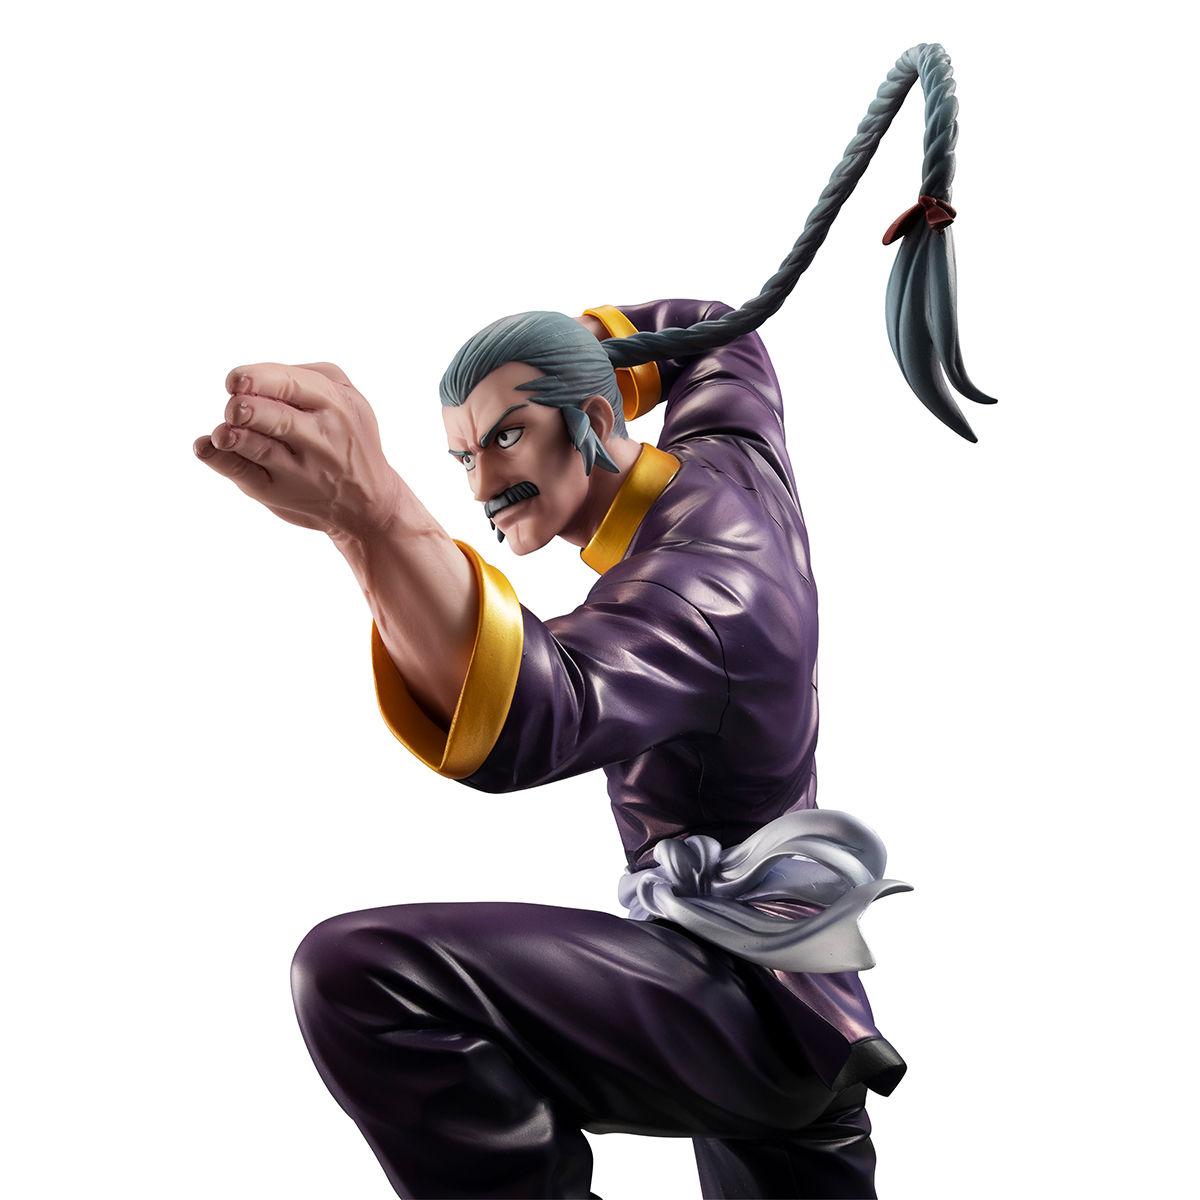 GGG『マスターアジア』機動武闘伝Gガンダム 完成品フィギュア-009